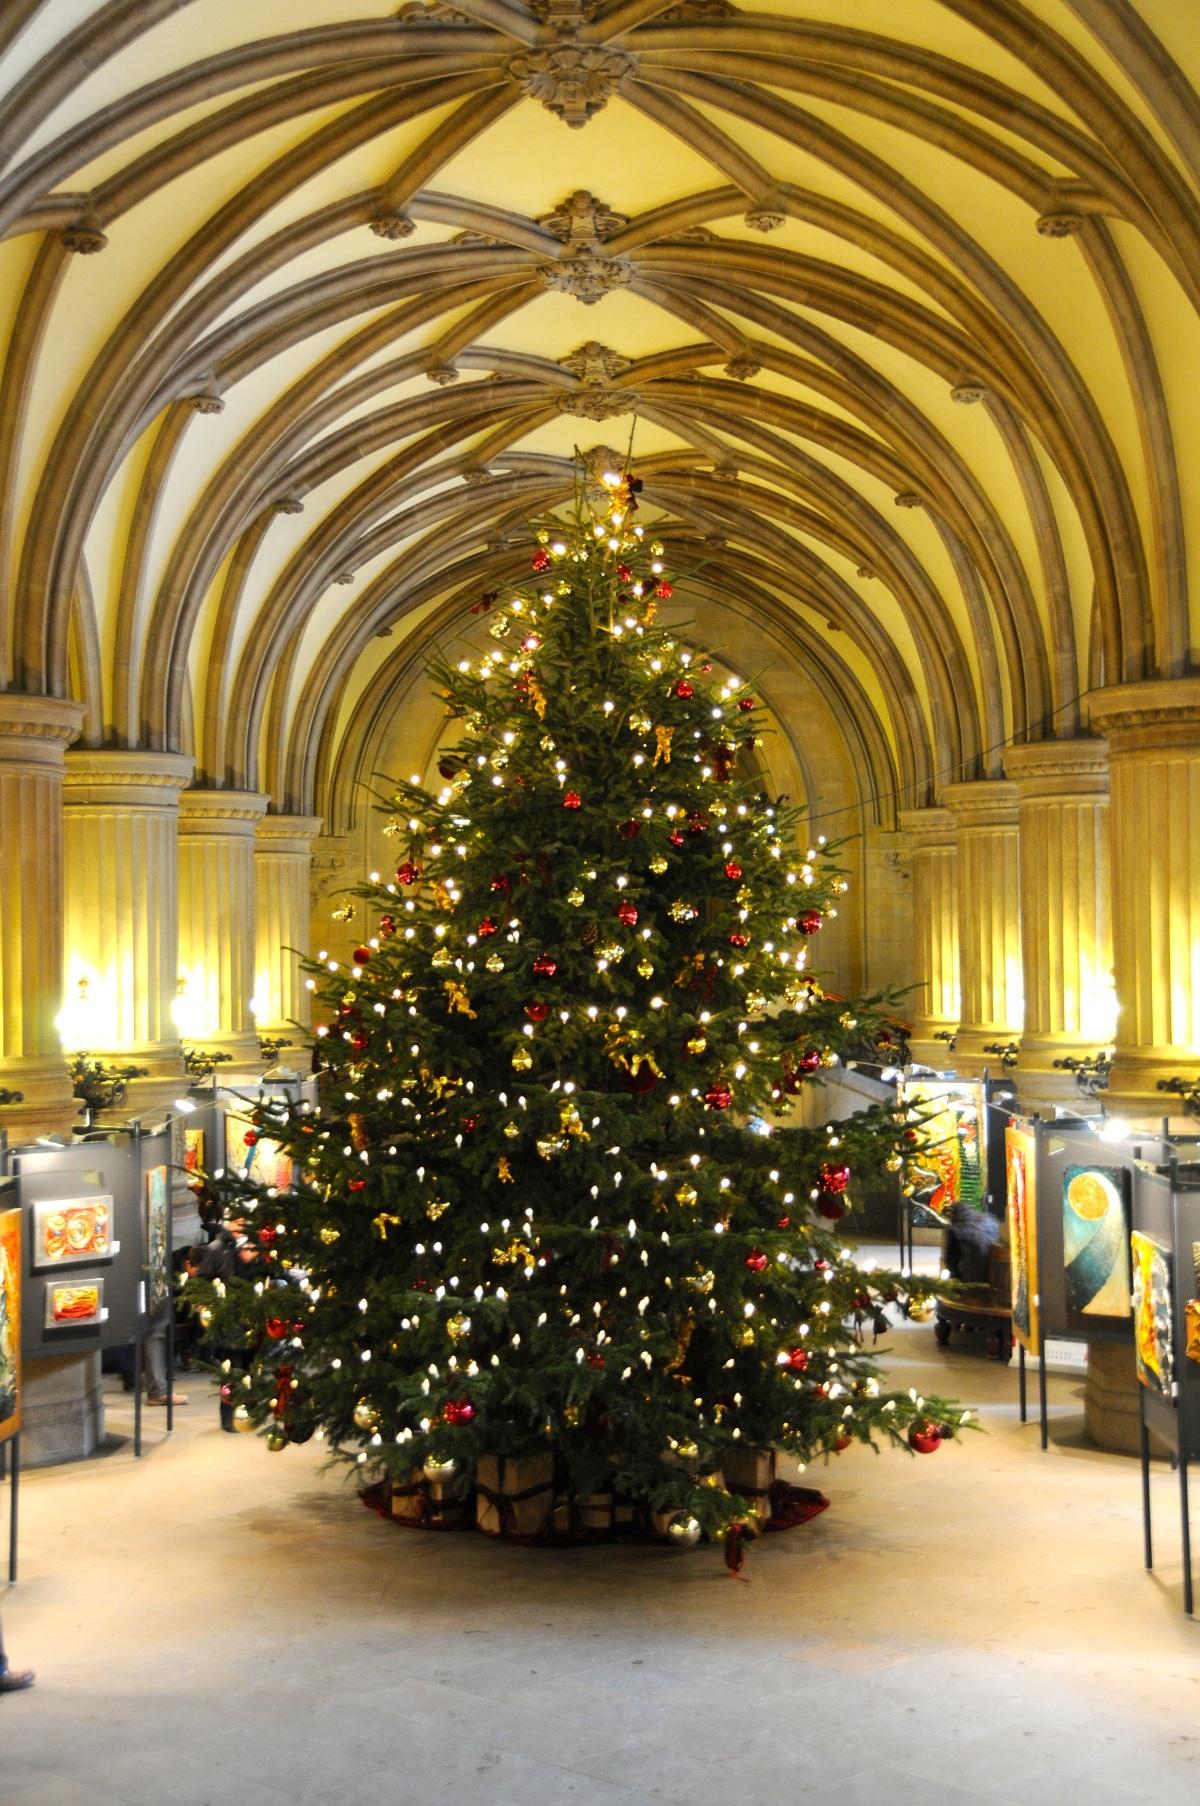 Weihnachtsbaum im Hamburger Rathaus, 2012 © GartenAkademie.com